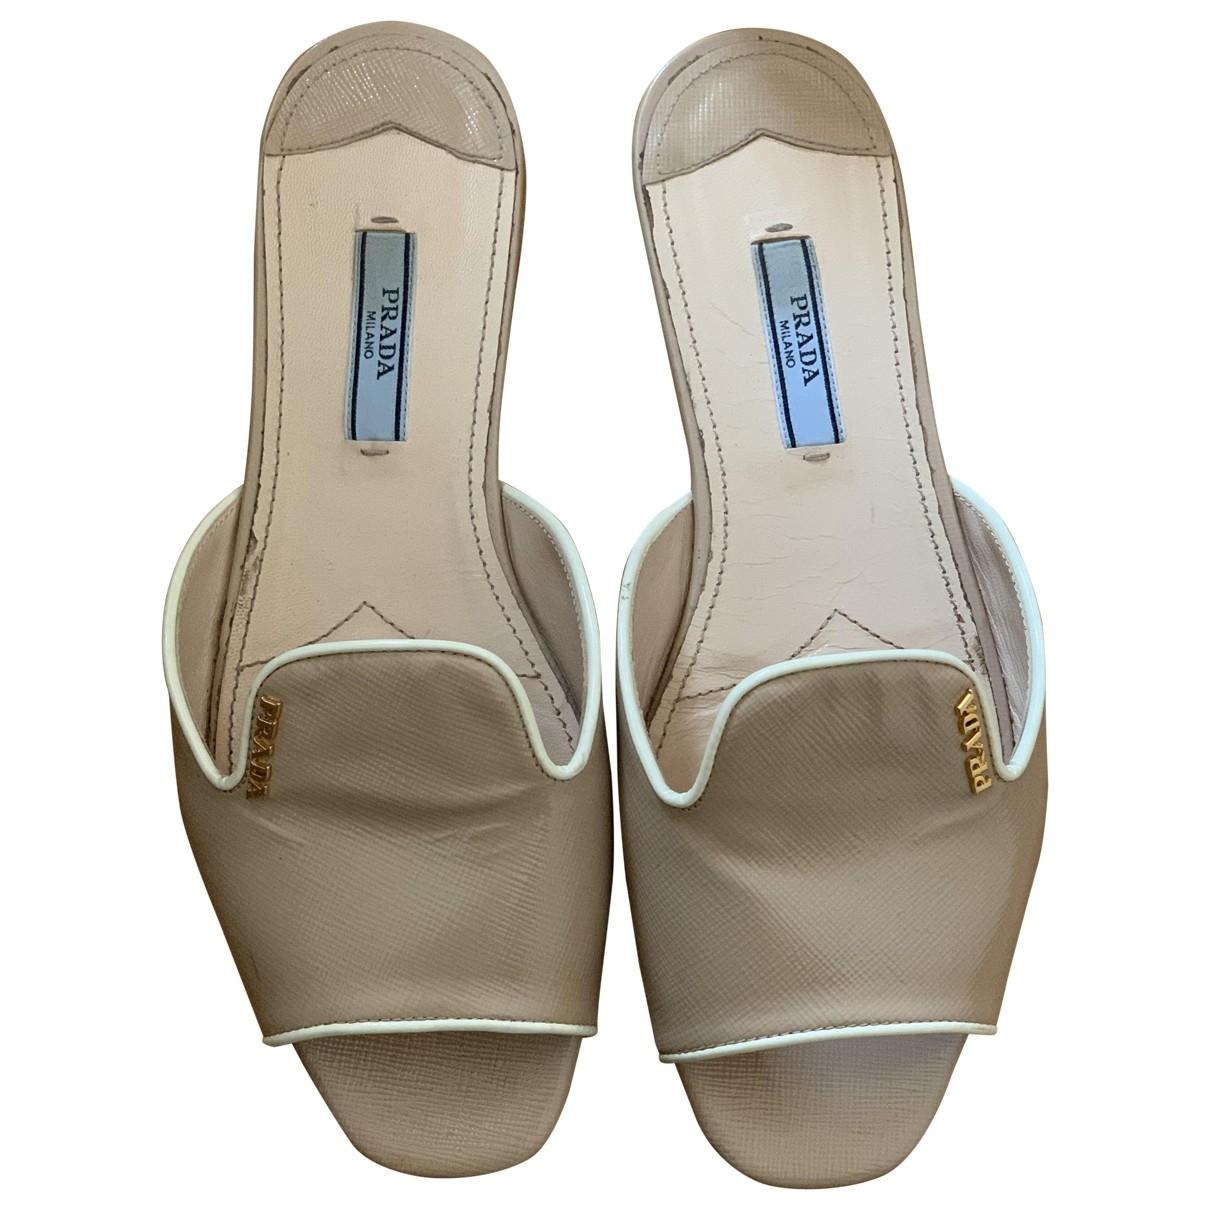 Prada \N Beige Leather Sandals for Women 37 EU